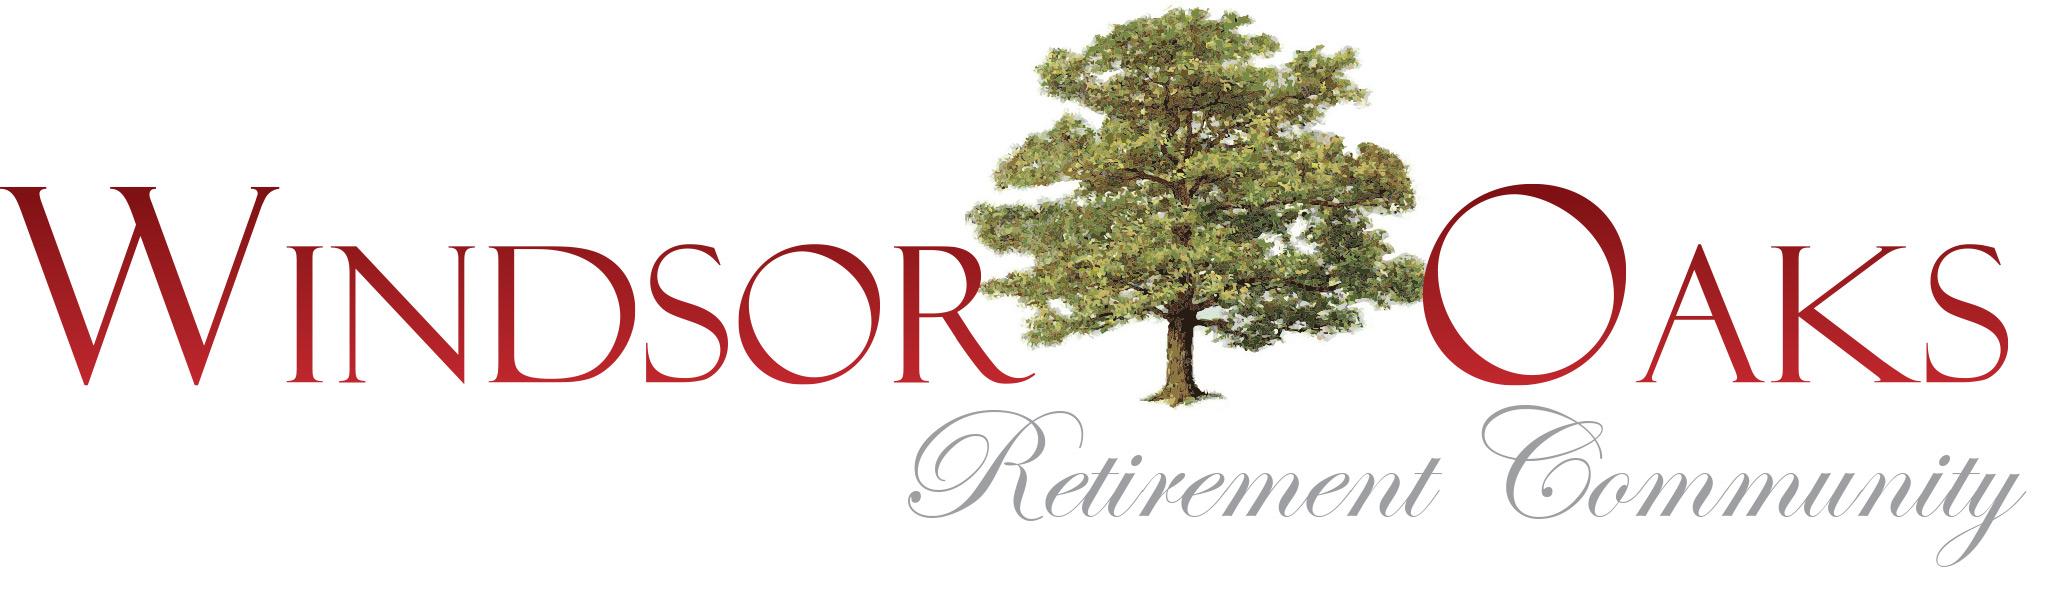 Windsor Oaks Senior Living | Ames, IA | Unique Vibrant Community